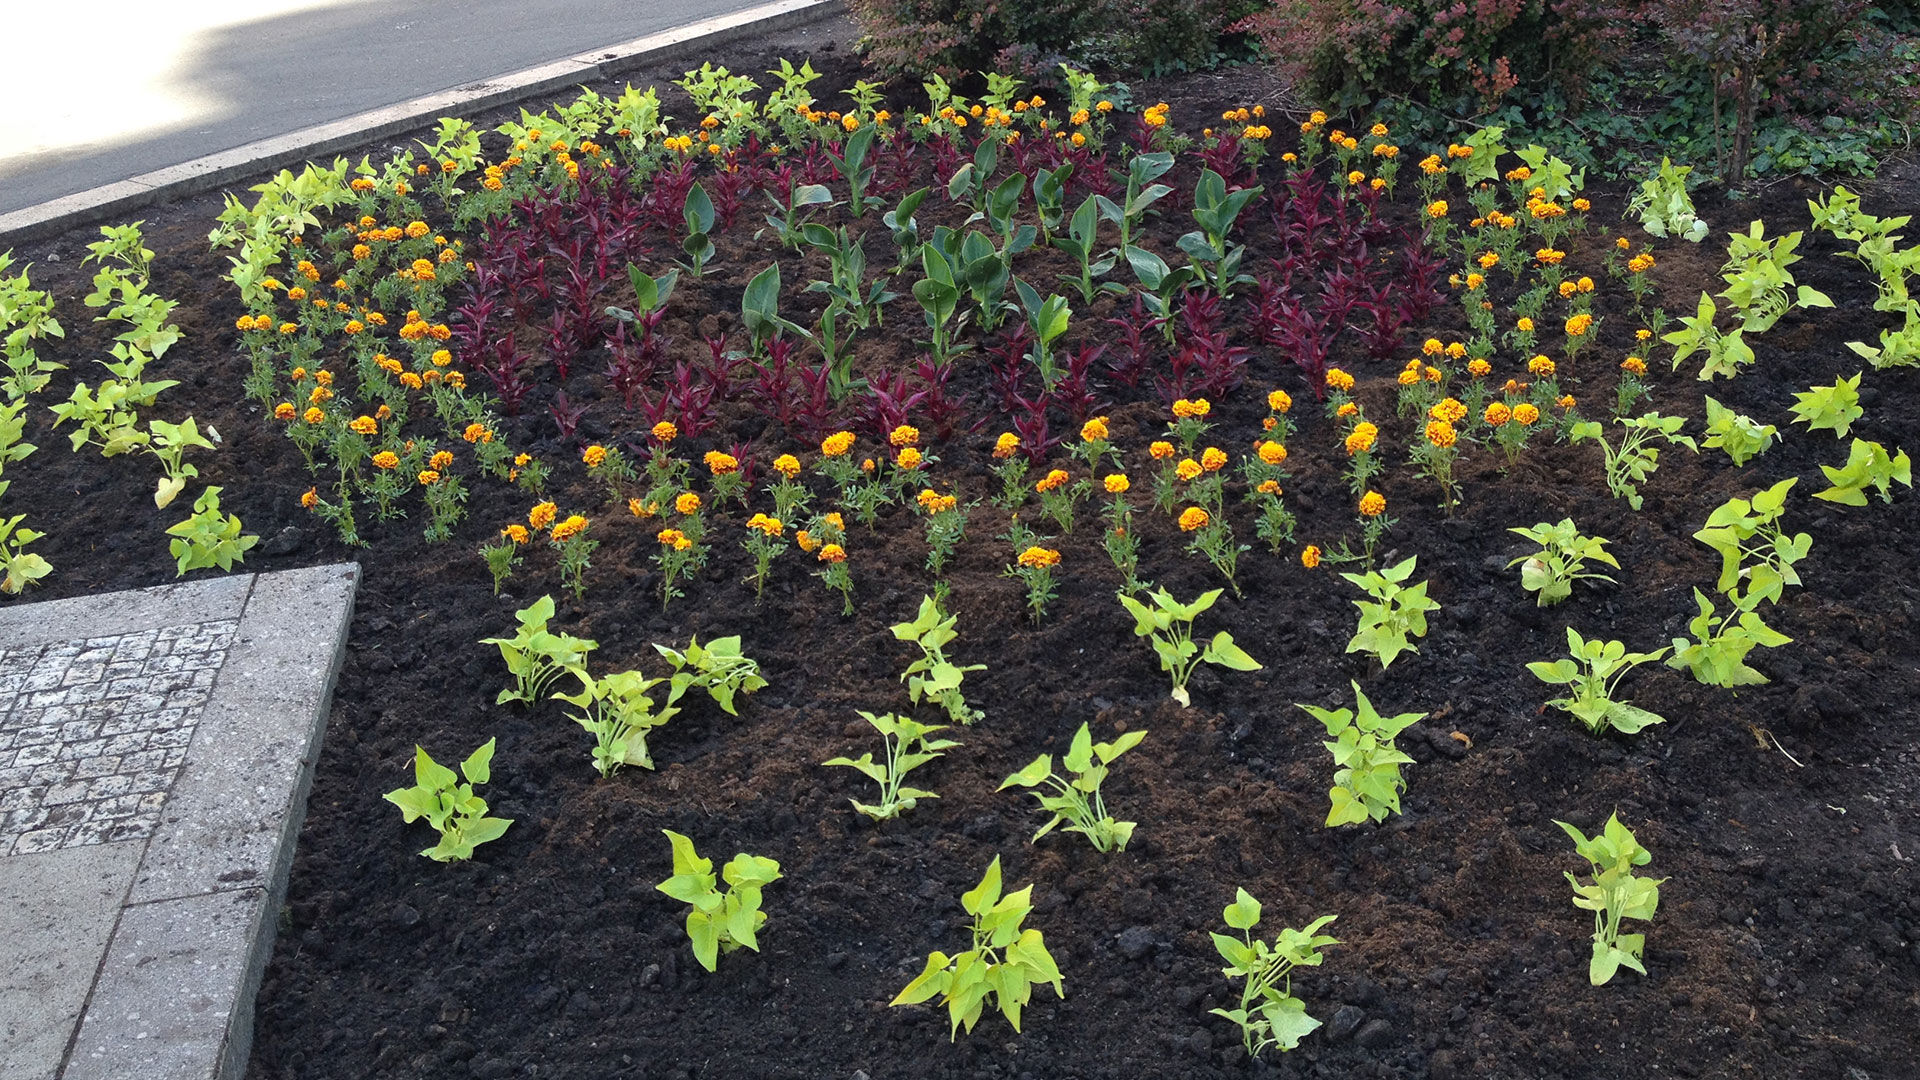 PLANTING FLOWERS ON WENCESLAS SQUARE